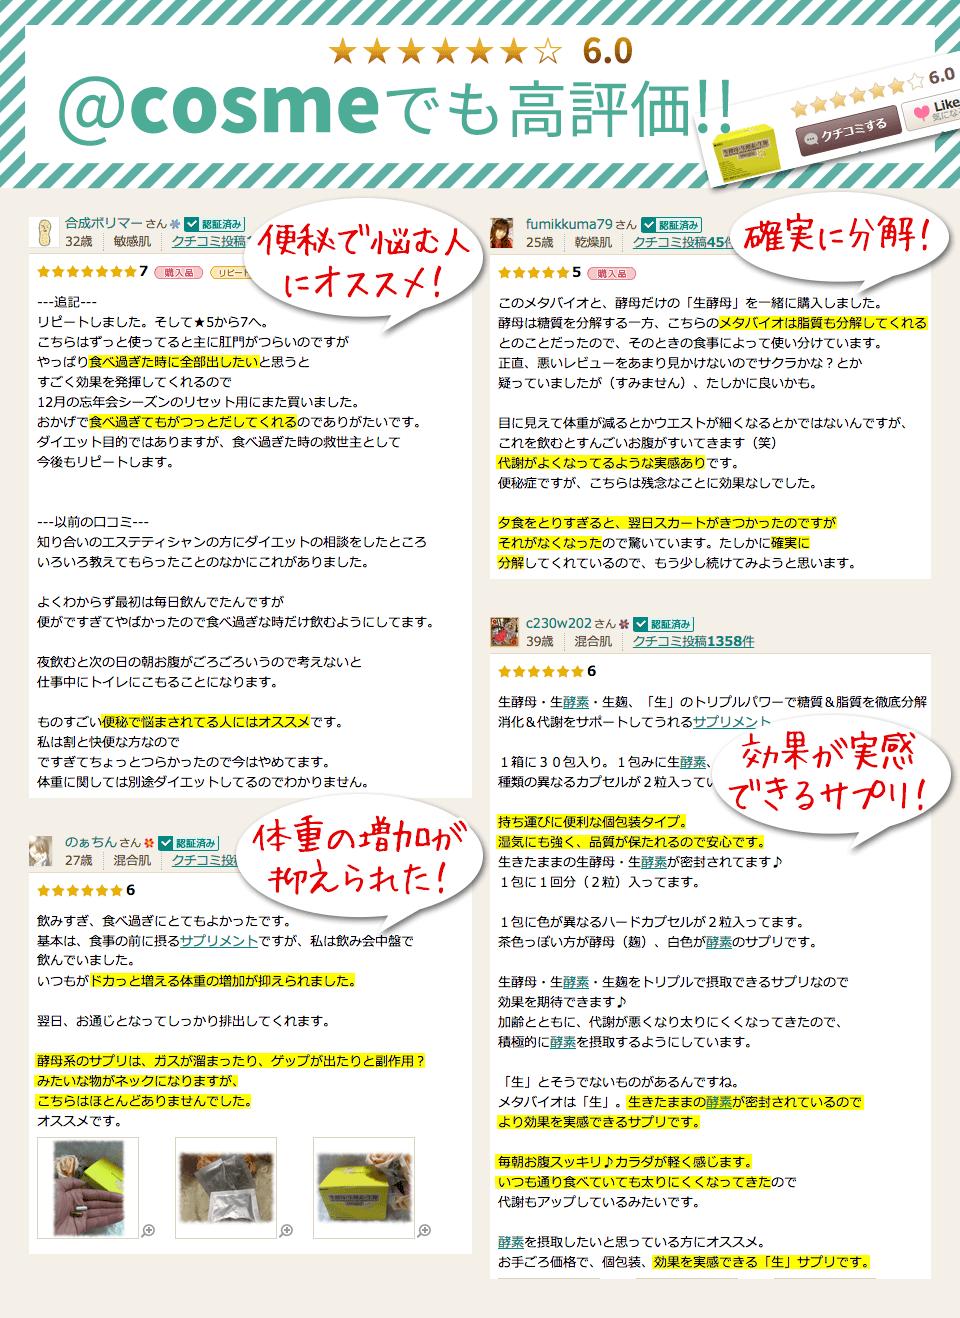 @COSMEでも高評価!!